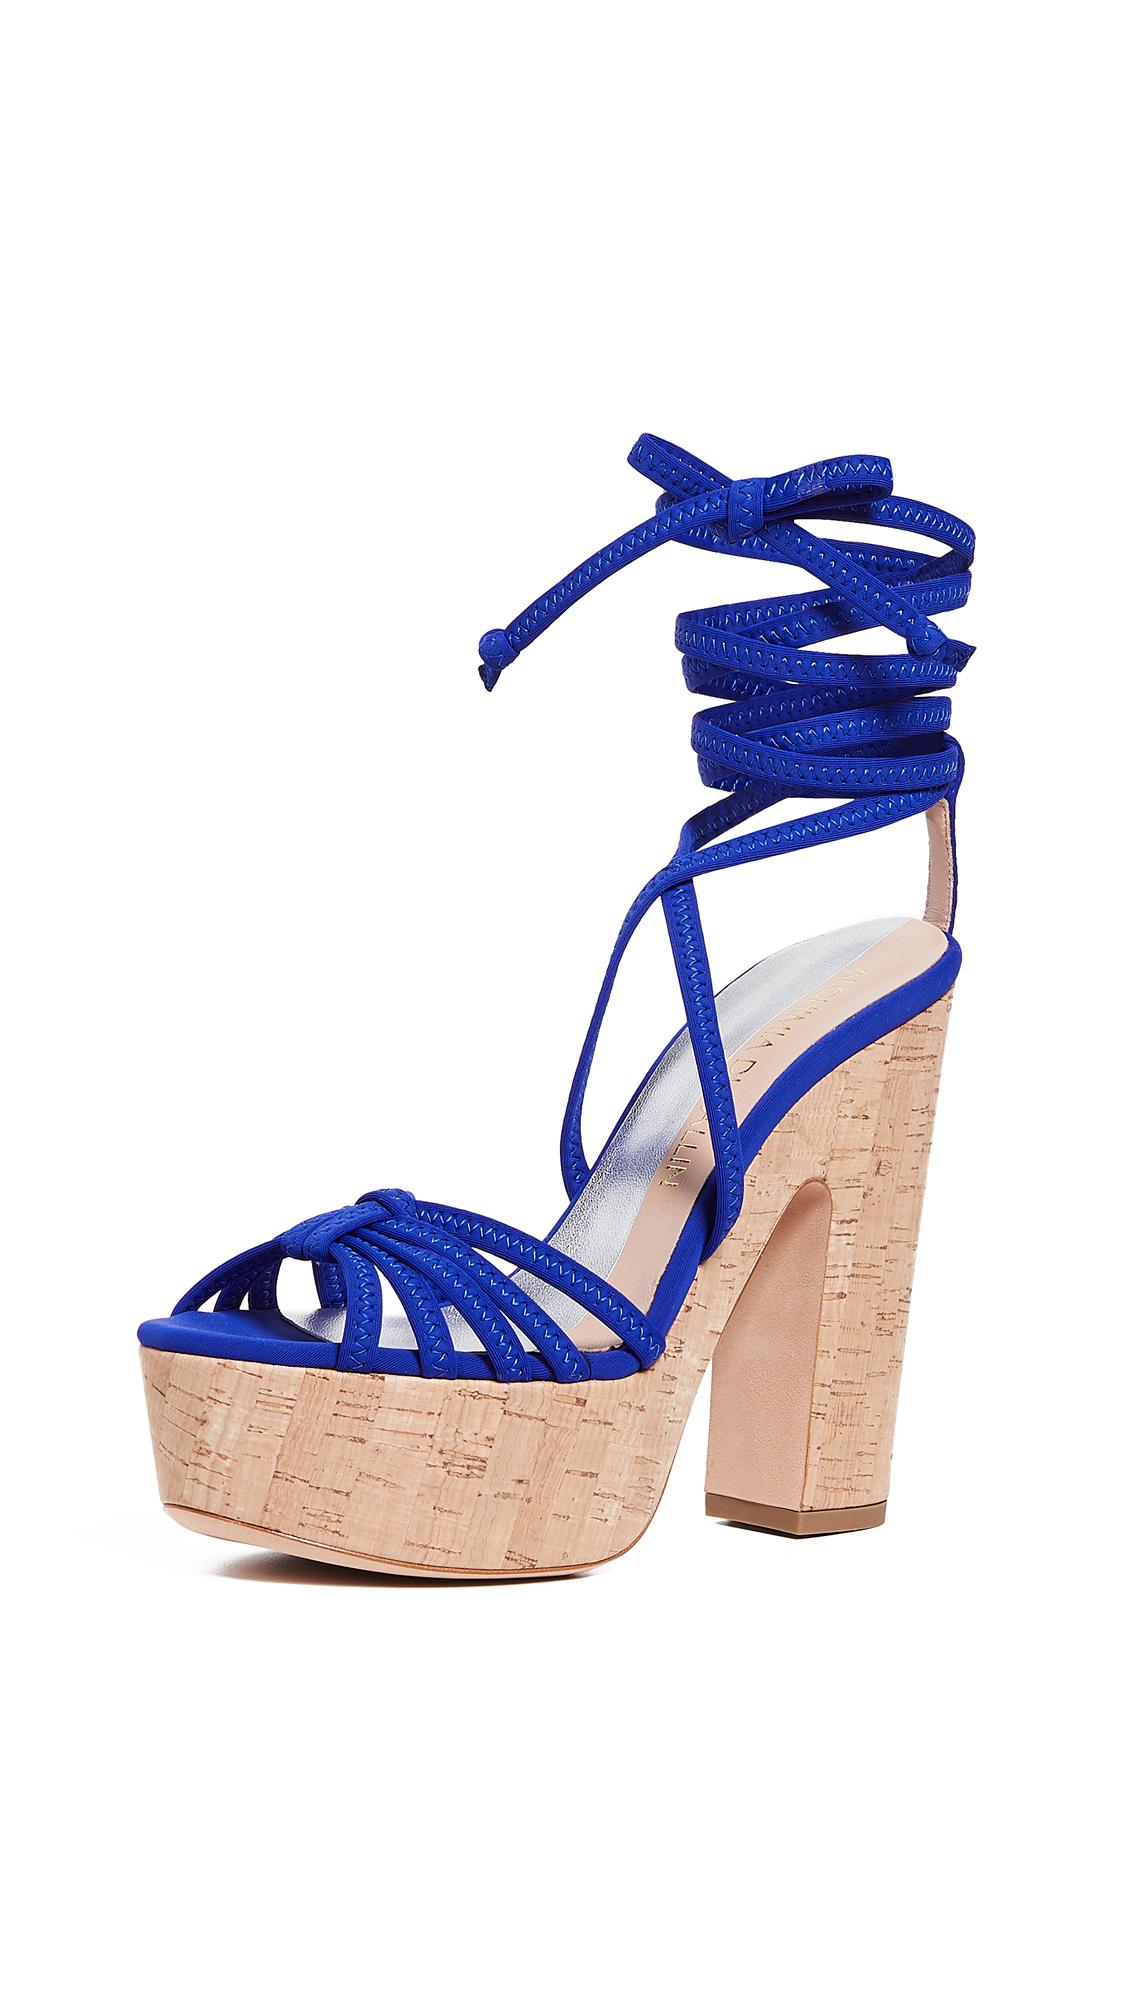 Alchimia di Ballin Bikini Platform Sandals - Cobalt